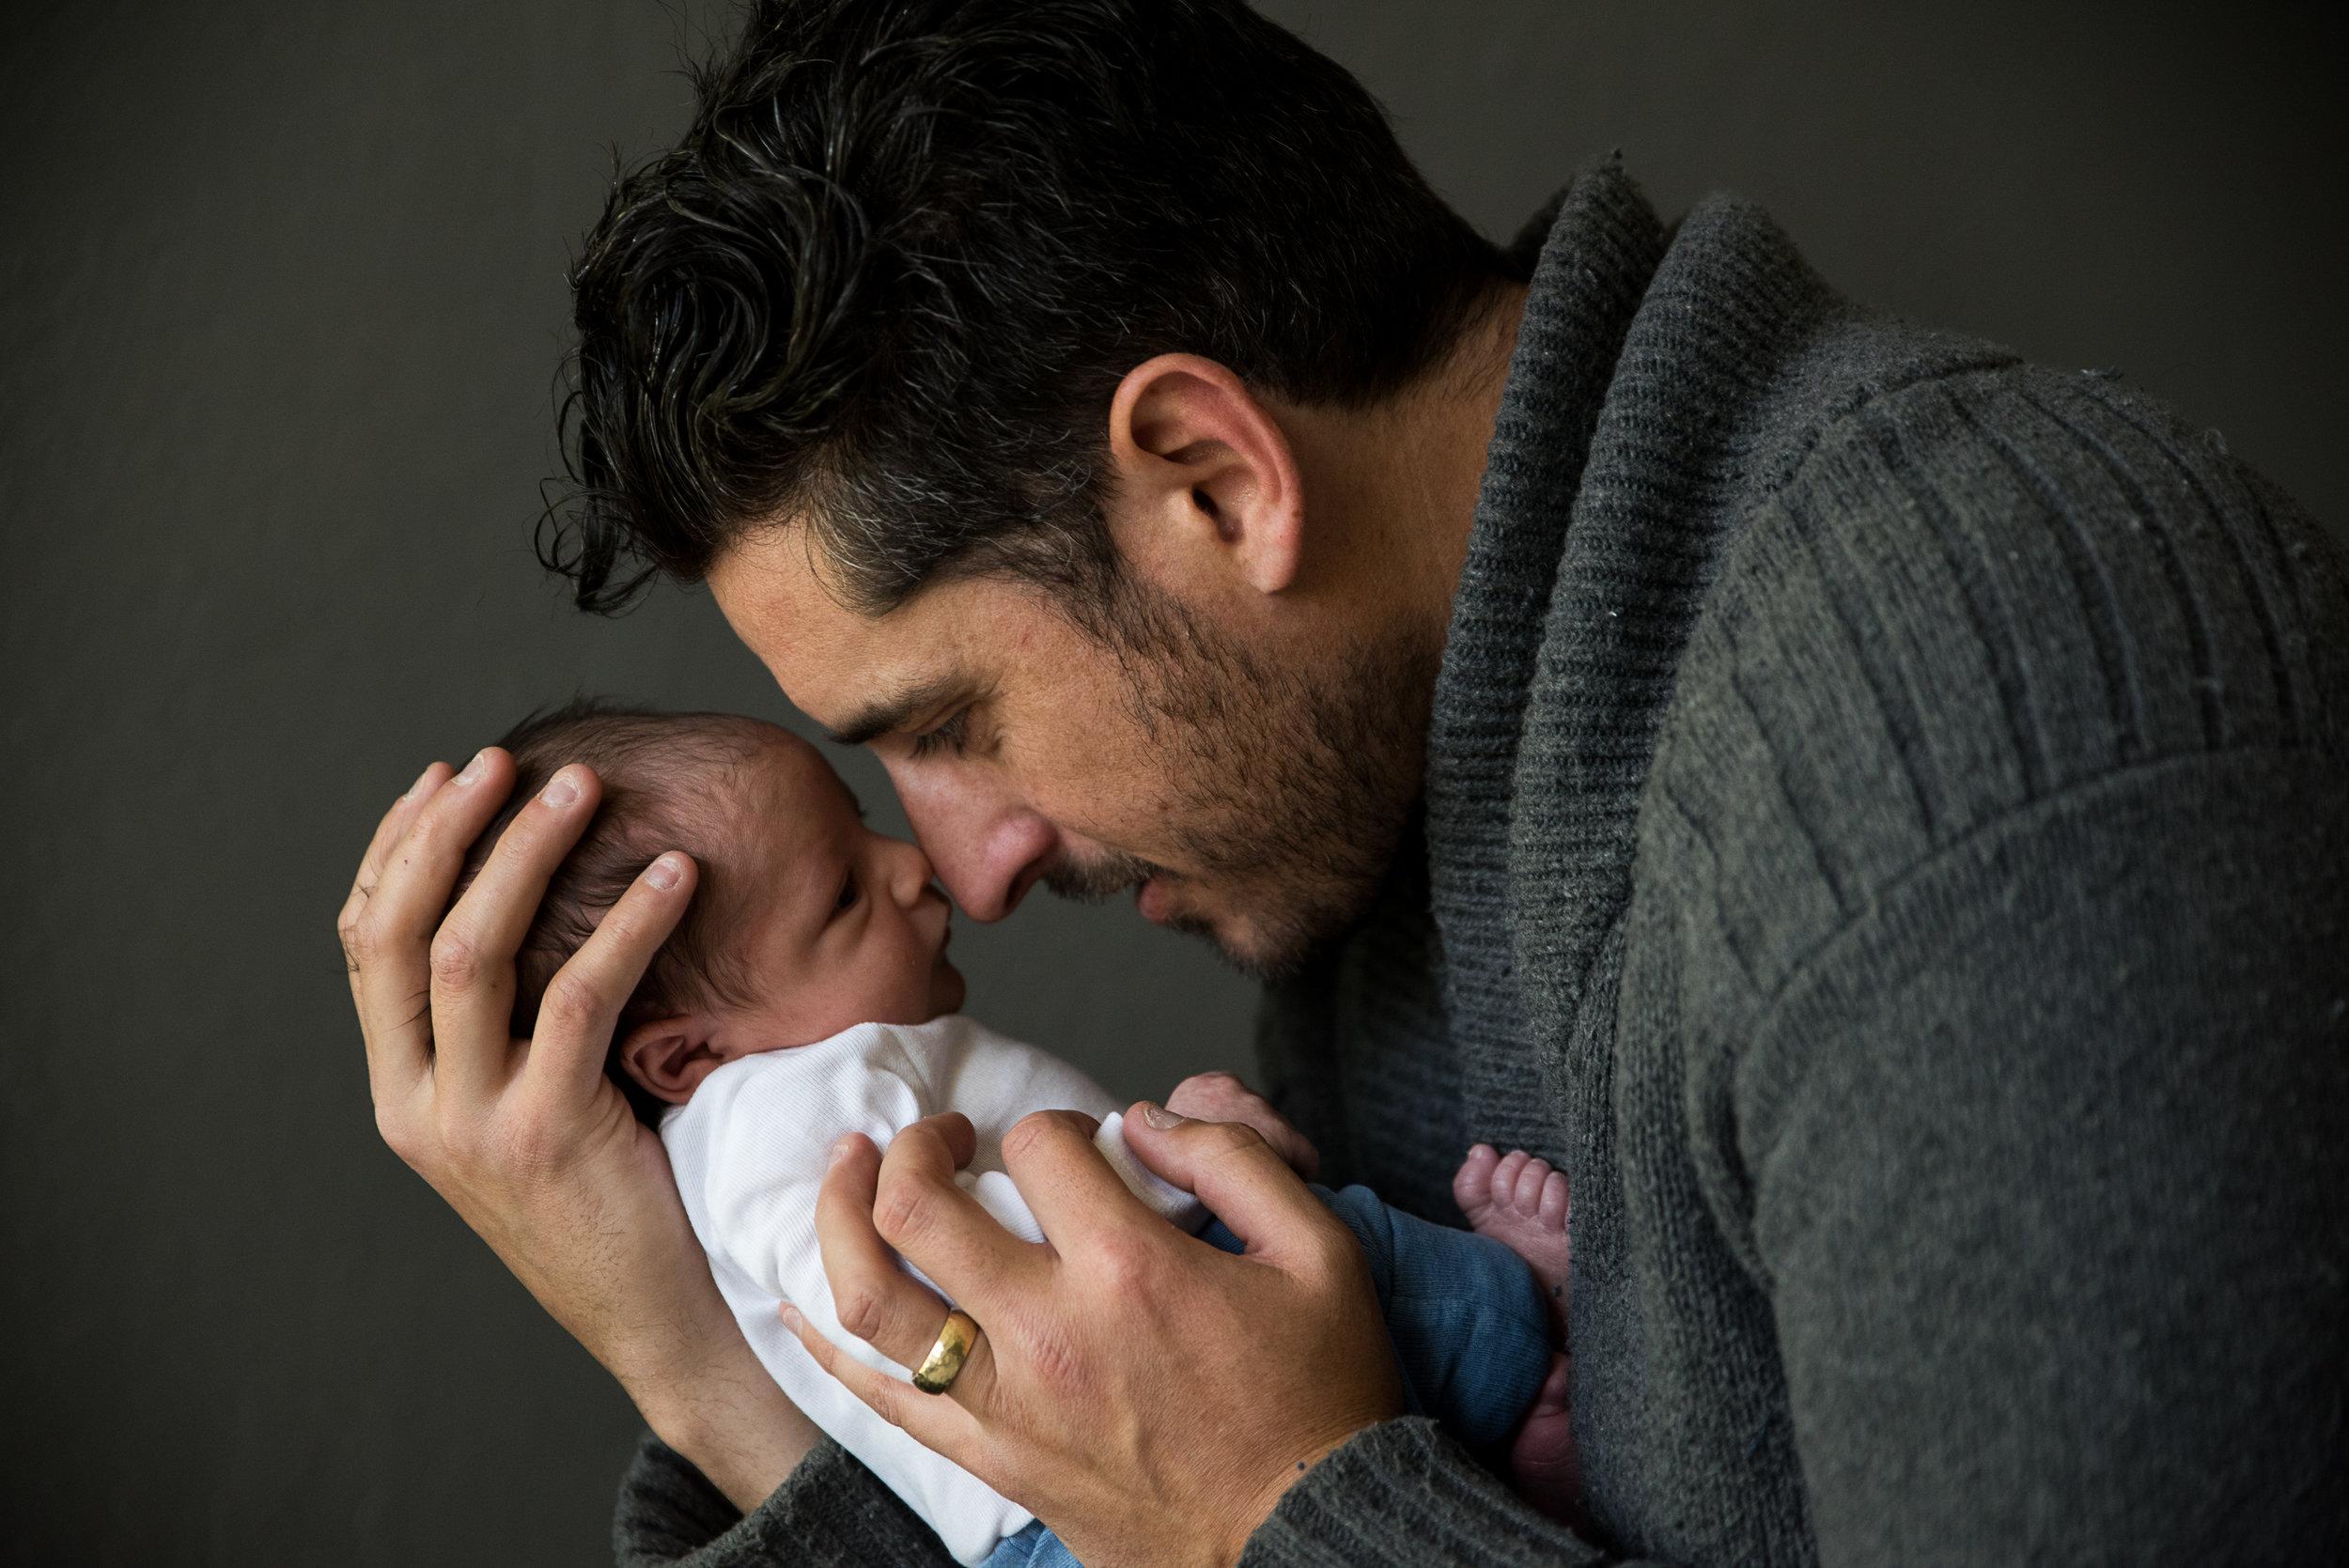 San Francisco Newborn Photographer, Amanda Anderson, photographs father and son